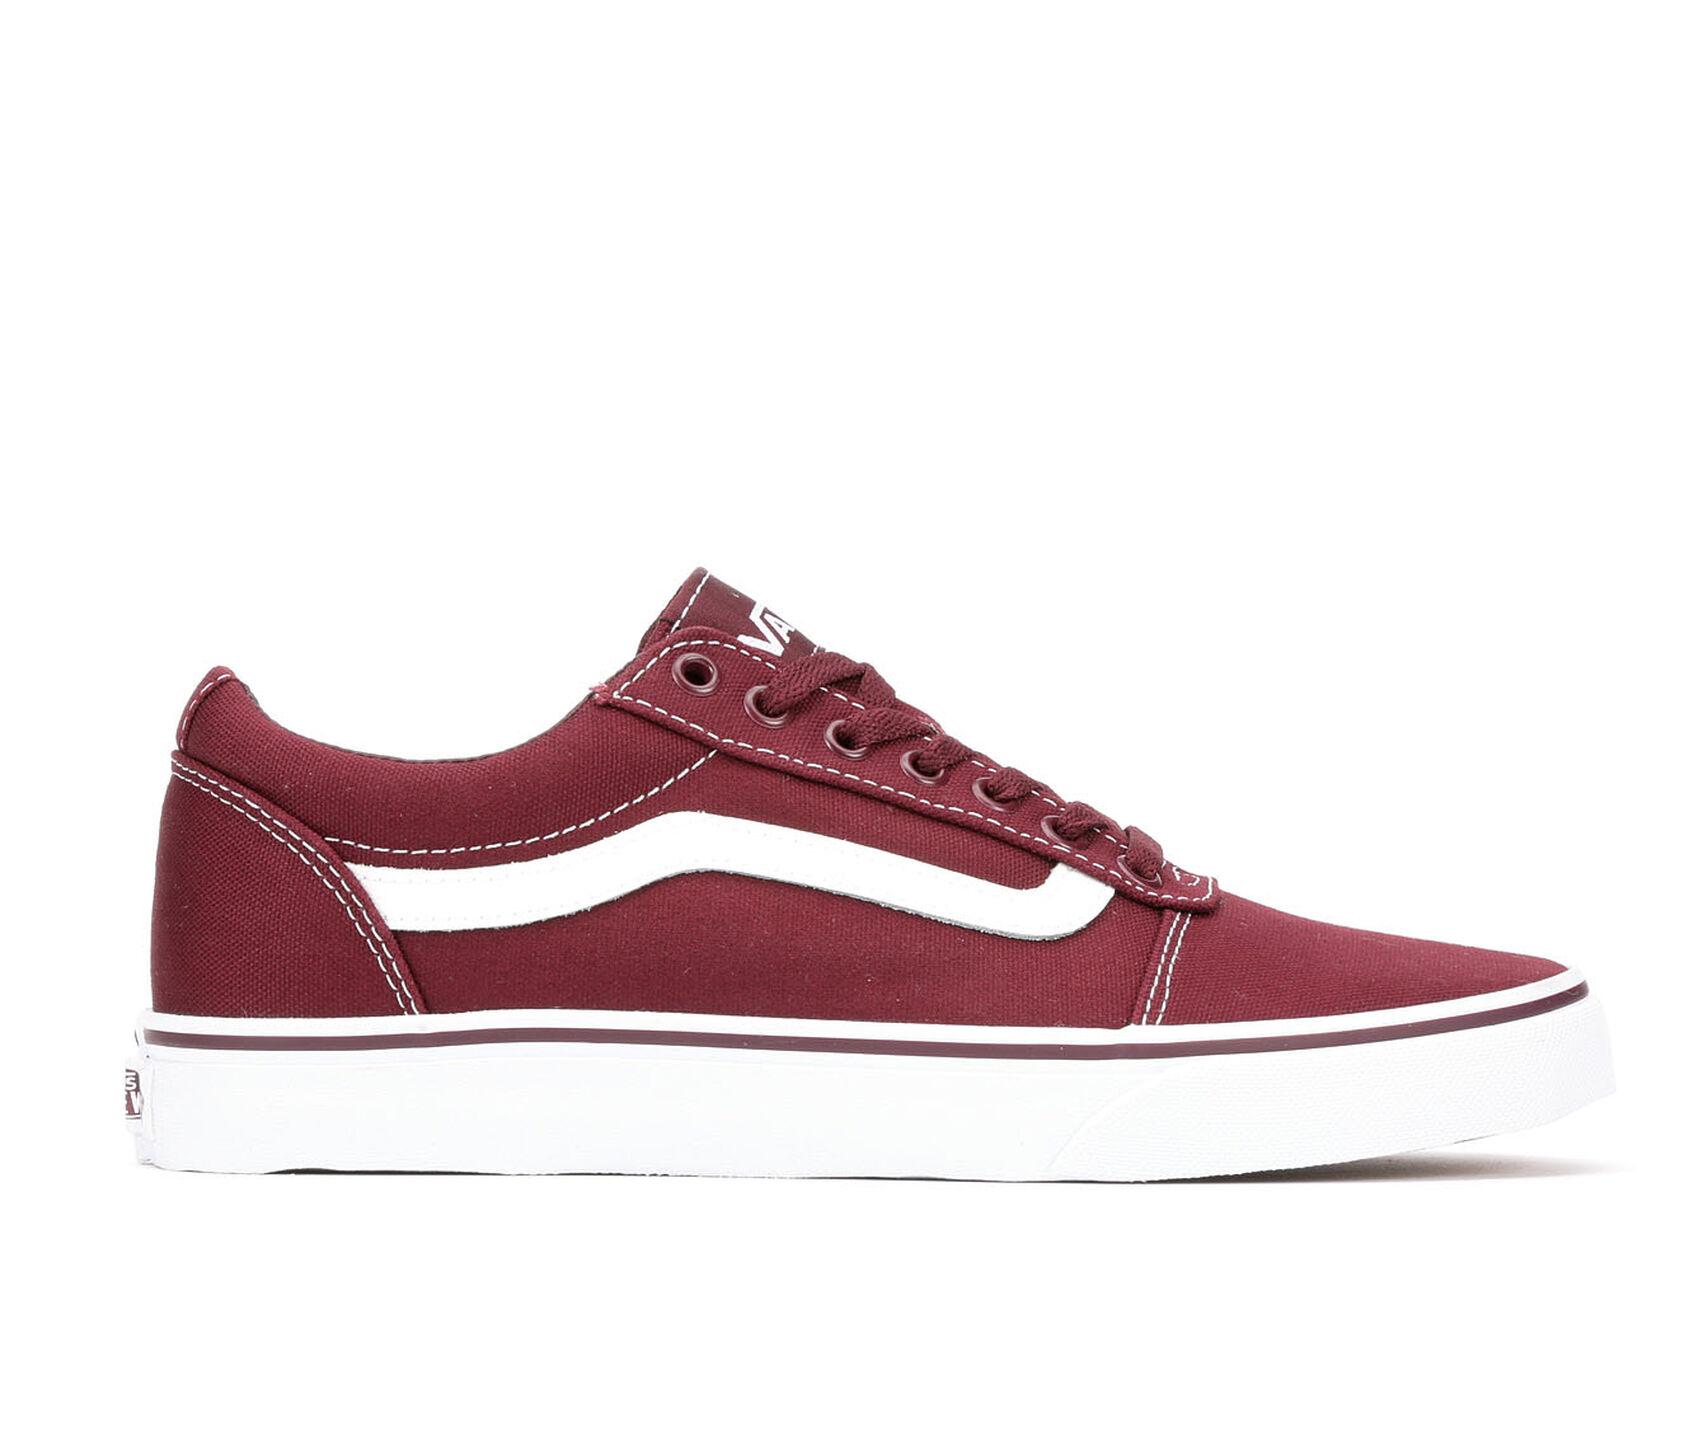 fa0c95fdd92697 Men s Vans Ward Skate Shoes